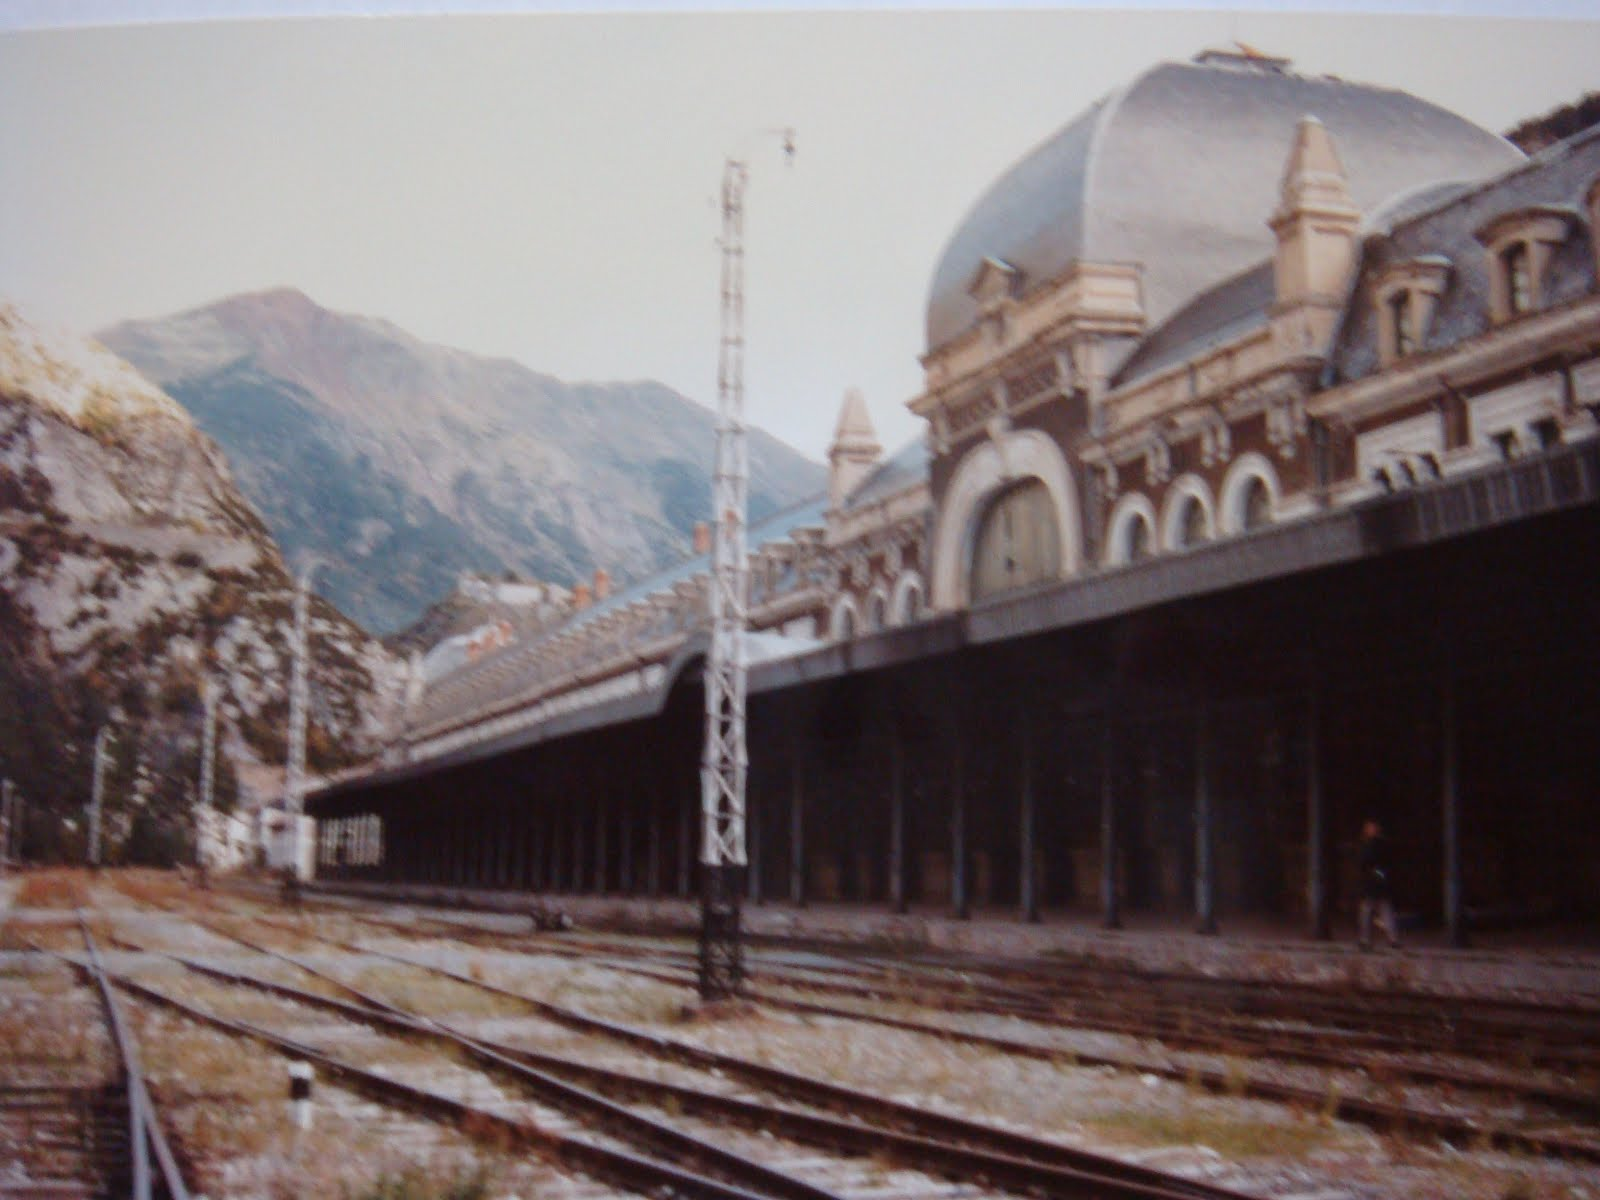 SUBIDA A CANFRANC 1996